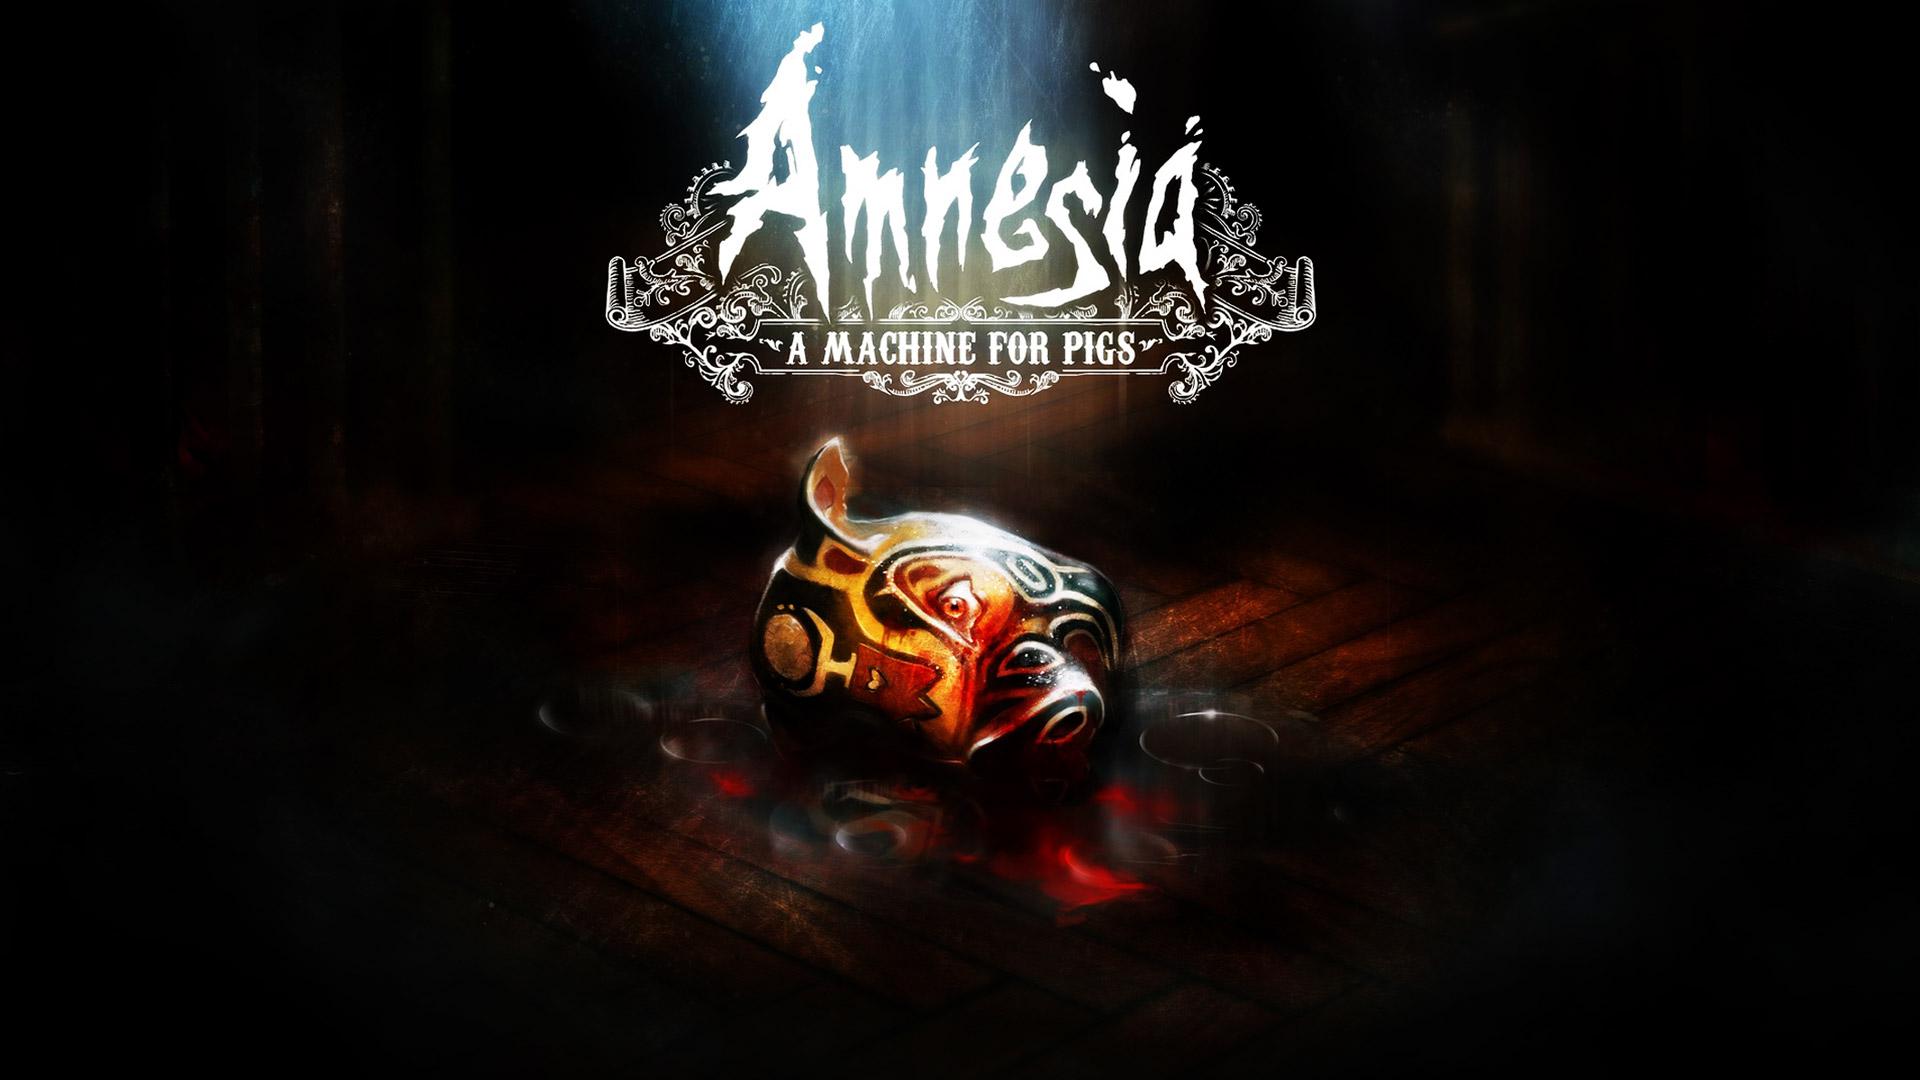 Free Amnesia: A Machine for Pigs Wallpaper in 1920x1080